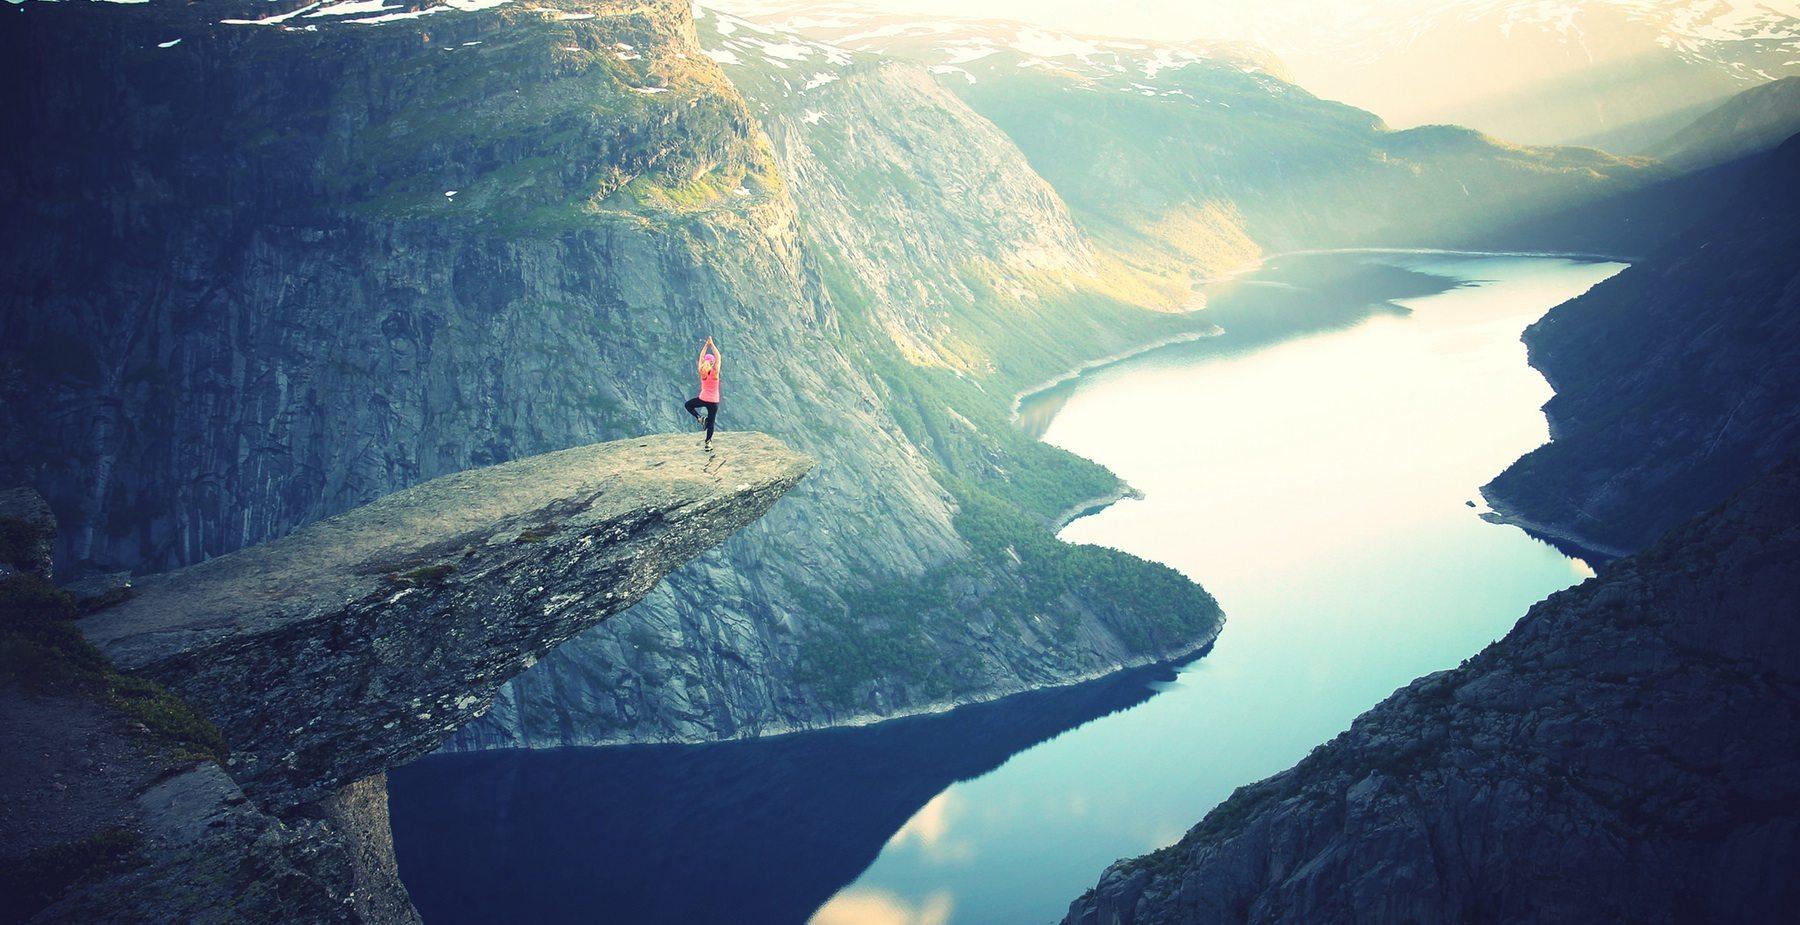 yoga_buoni propositi-unplash